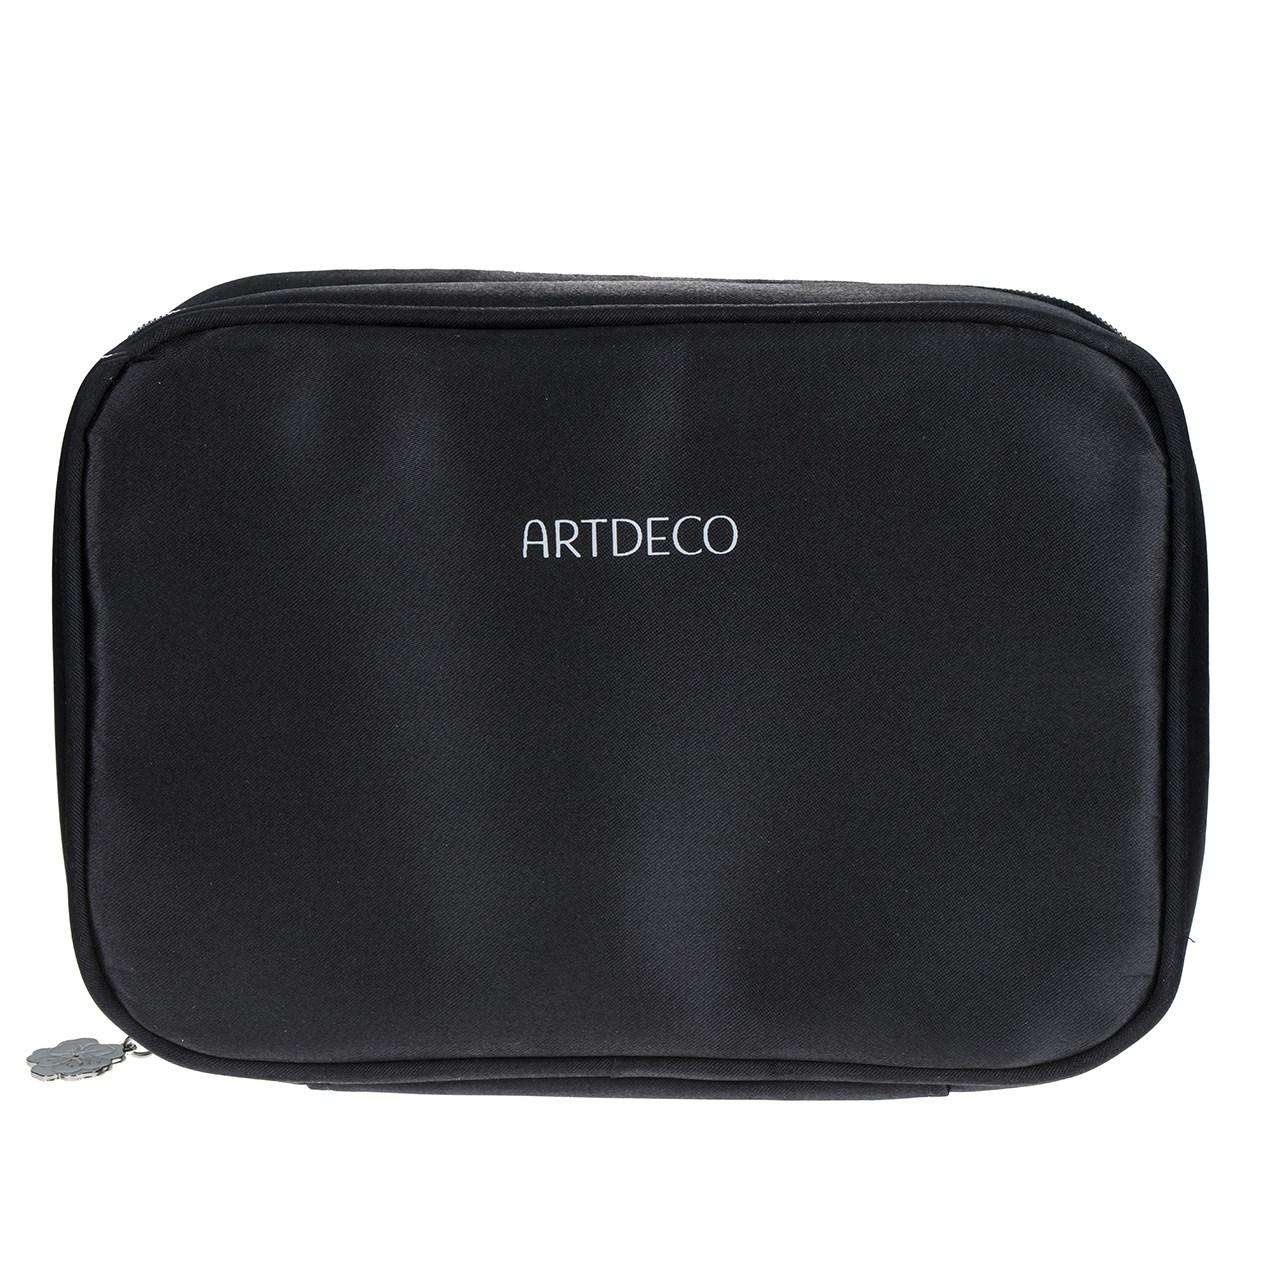 قیمت کیف لوازم آرایشی آرت دکو مدل professional Black